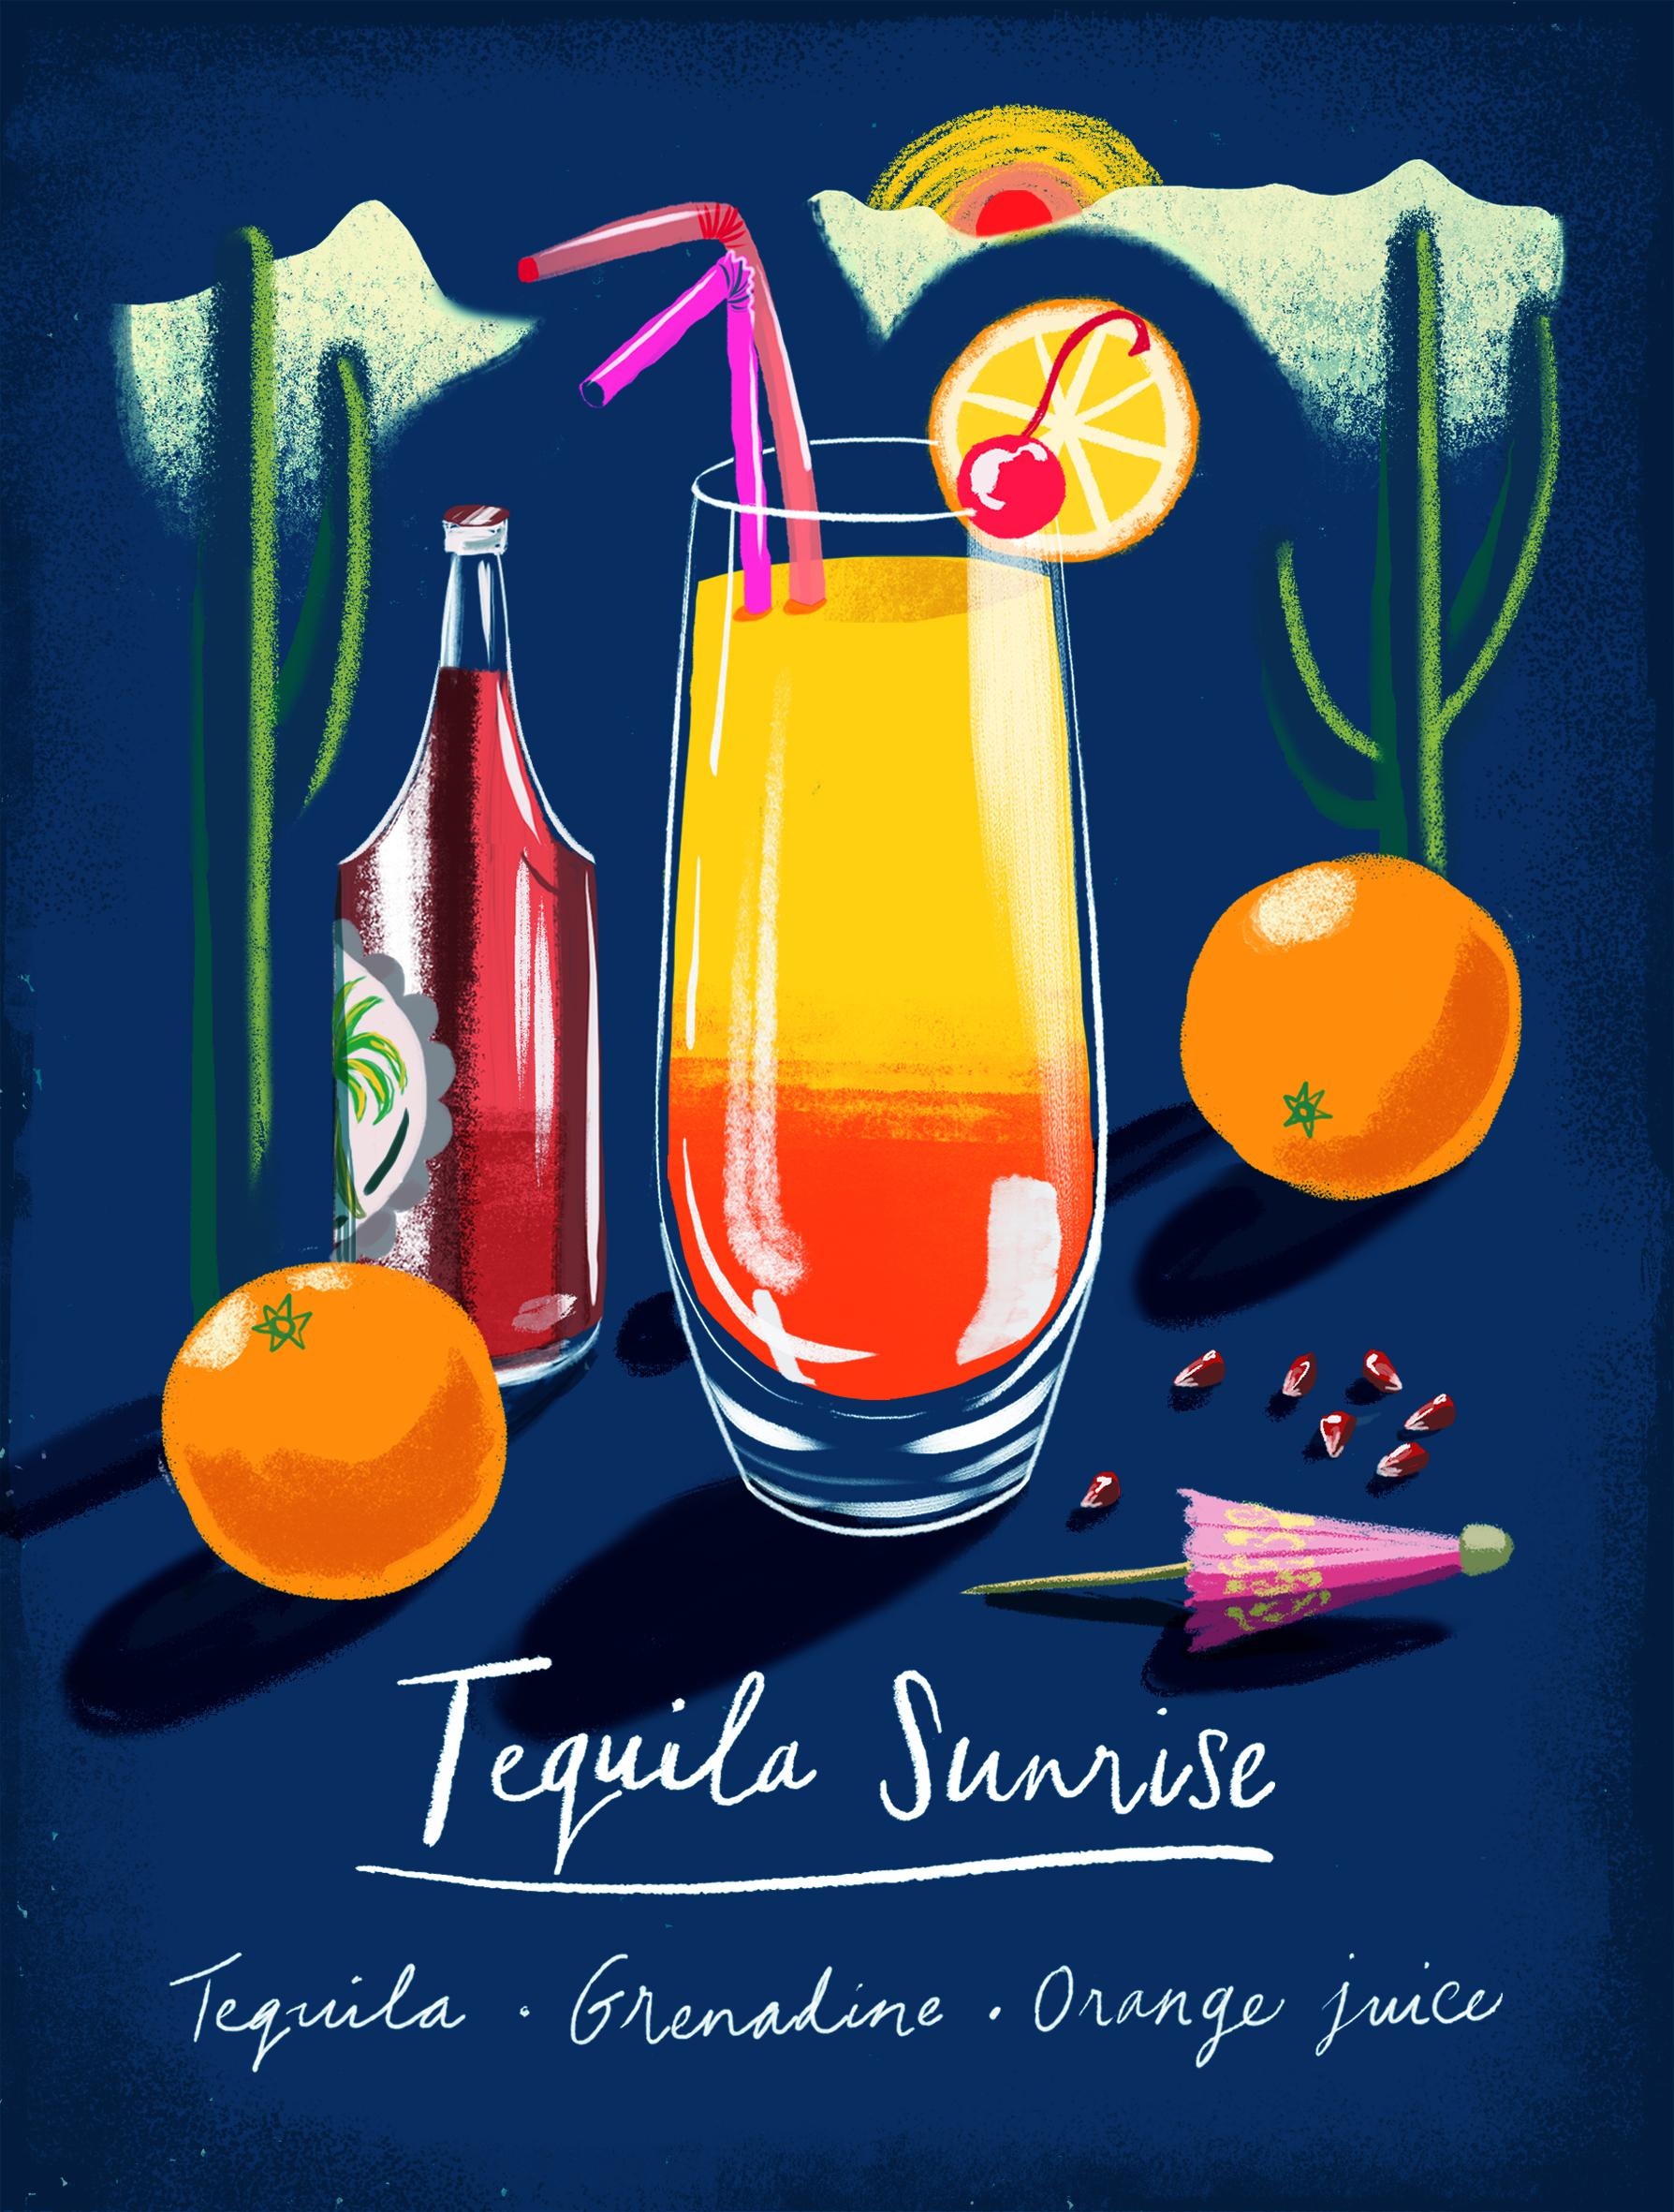 tequila sunrise2.jpg